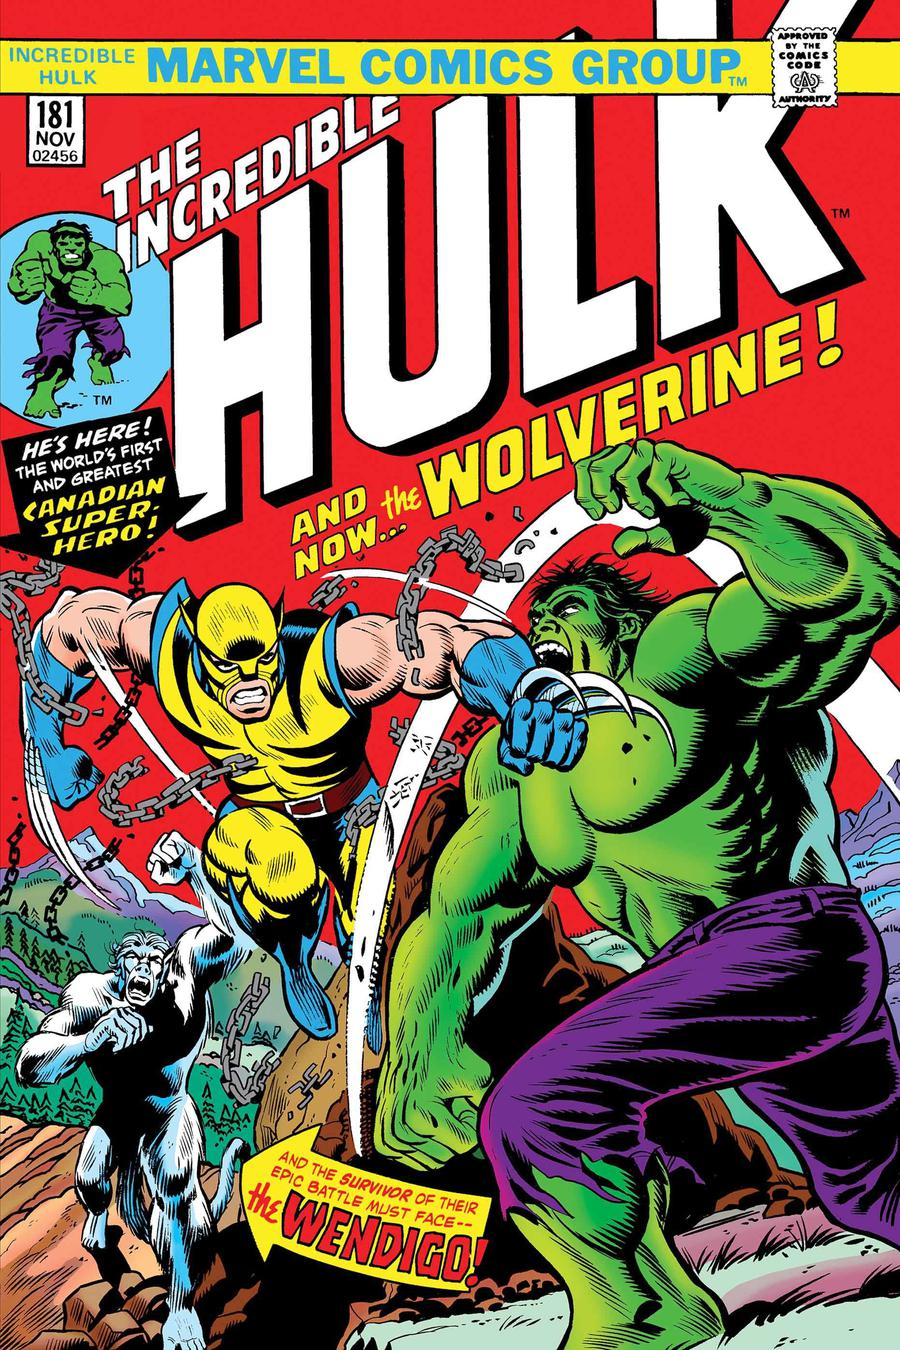 Incredible Hulk #181 Cover D Facsimile Edition New Ptg